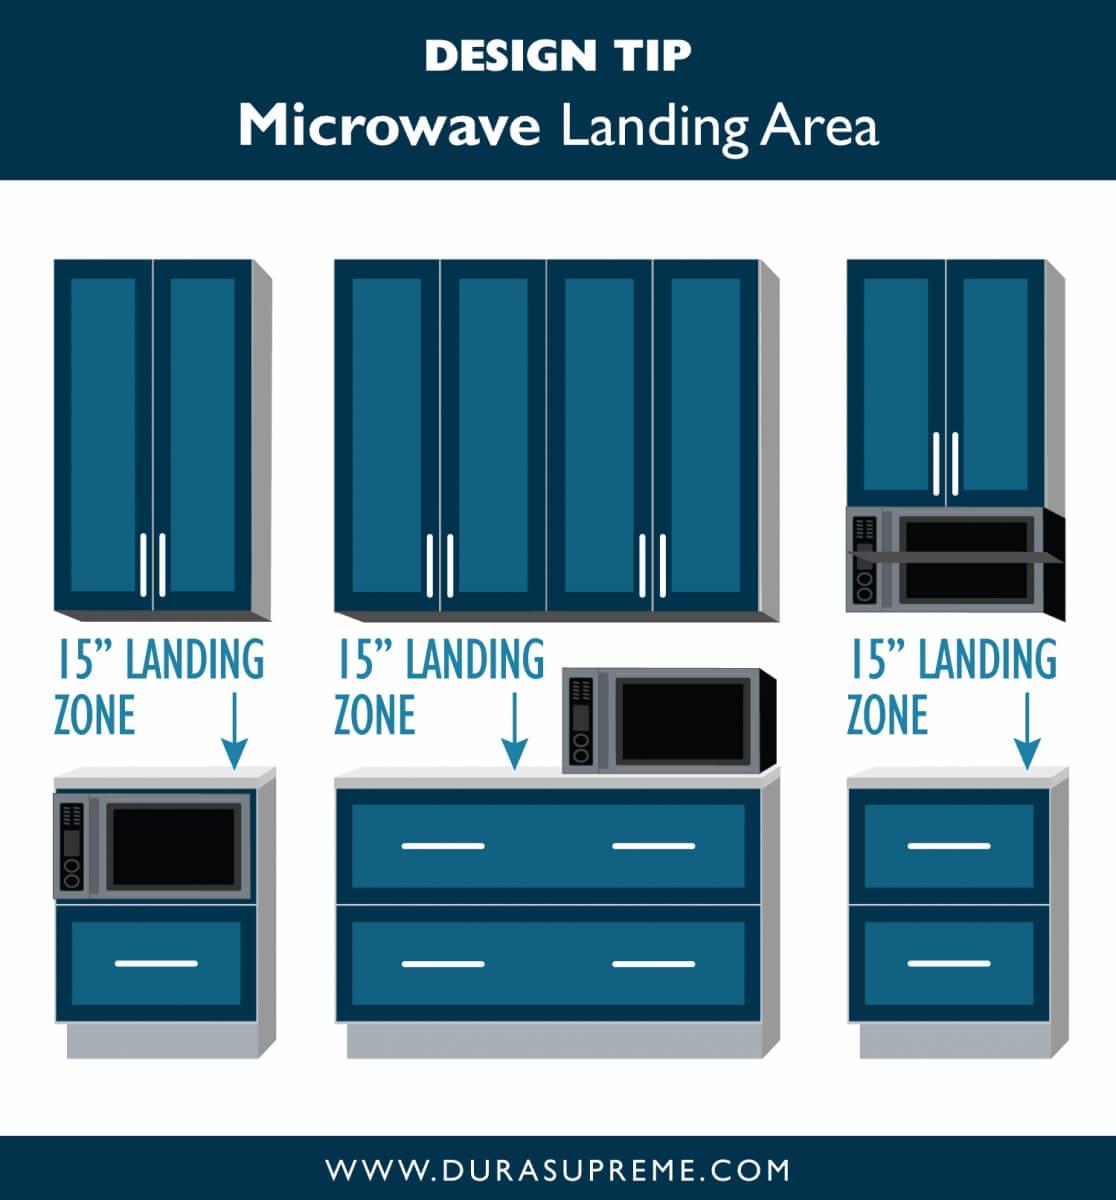 Kitchen Design Tip: Microwave Landing Areas